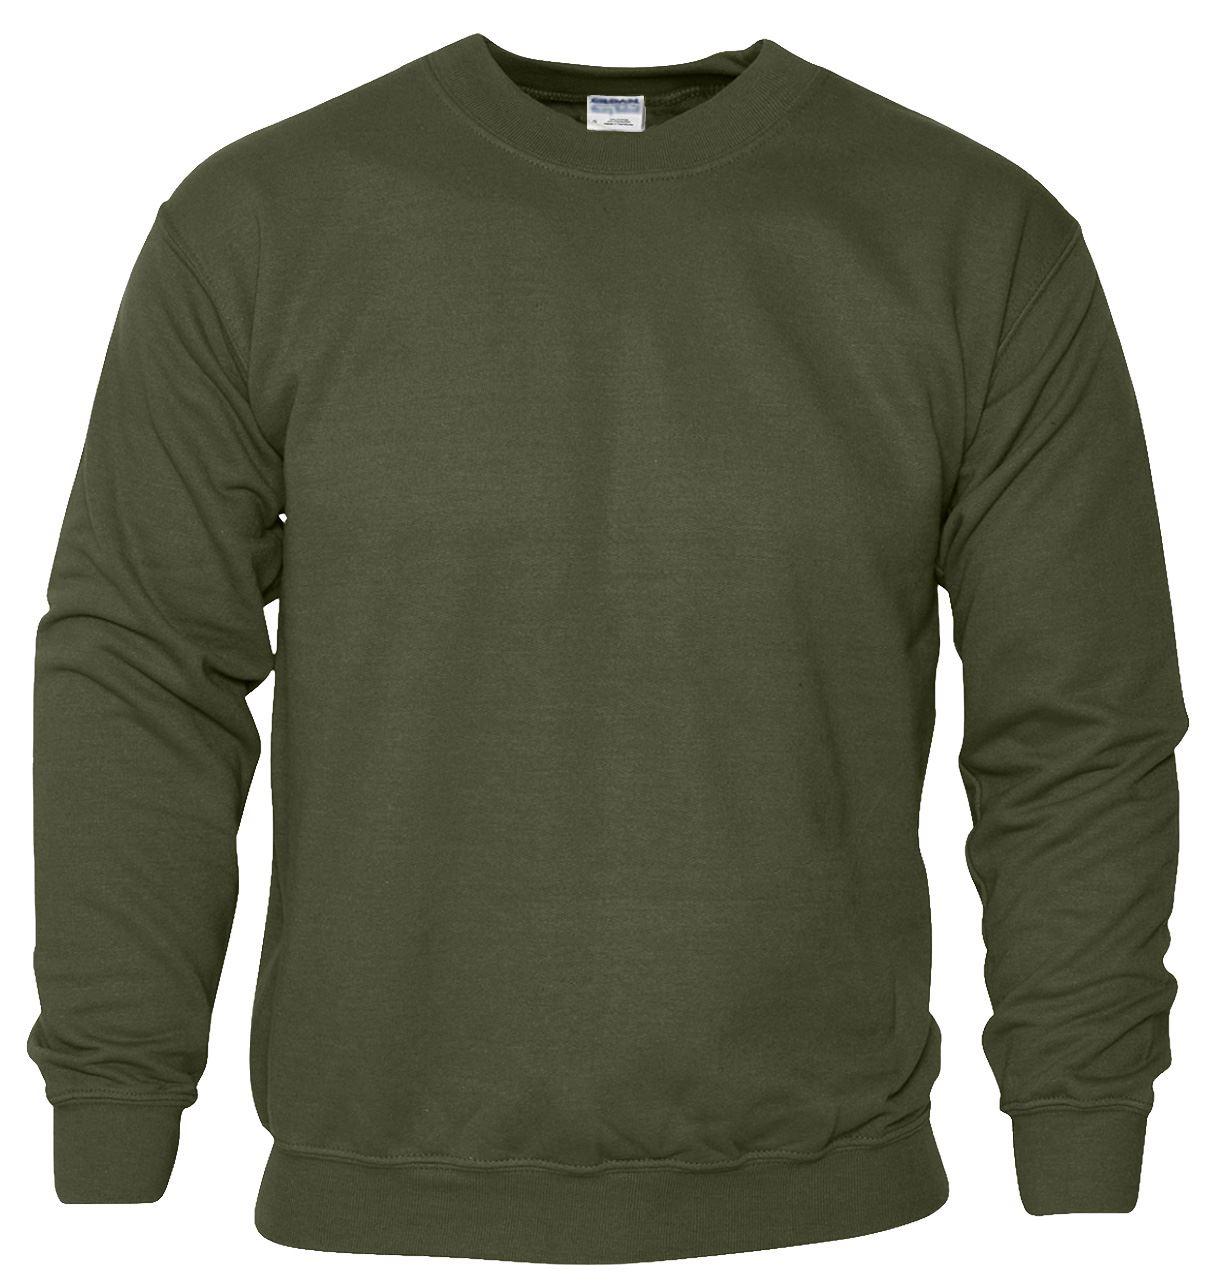 New Gildan Plain Sweatshirt Cotton Heavy Blend Crew Neck Sweater Blank Pullover